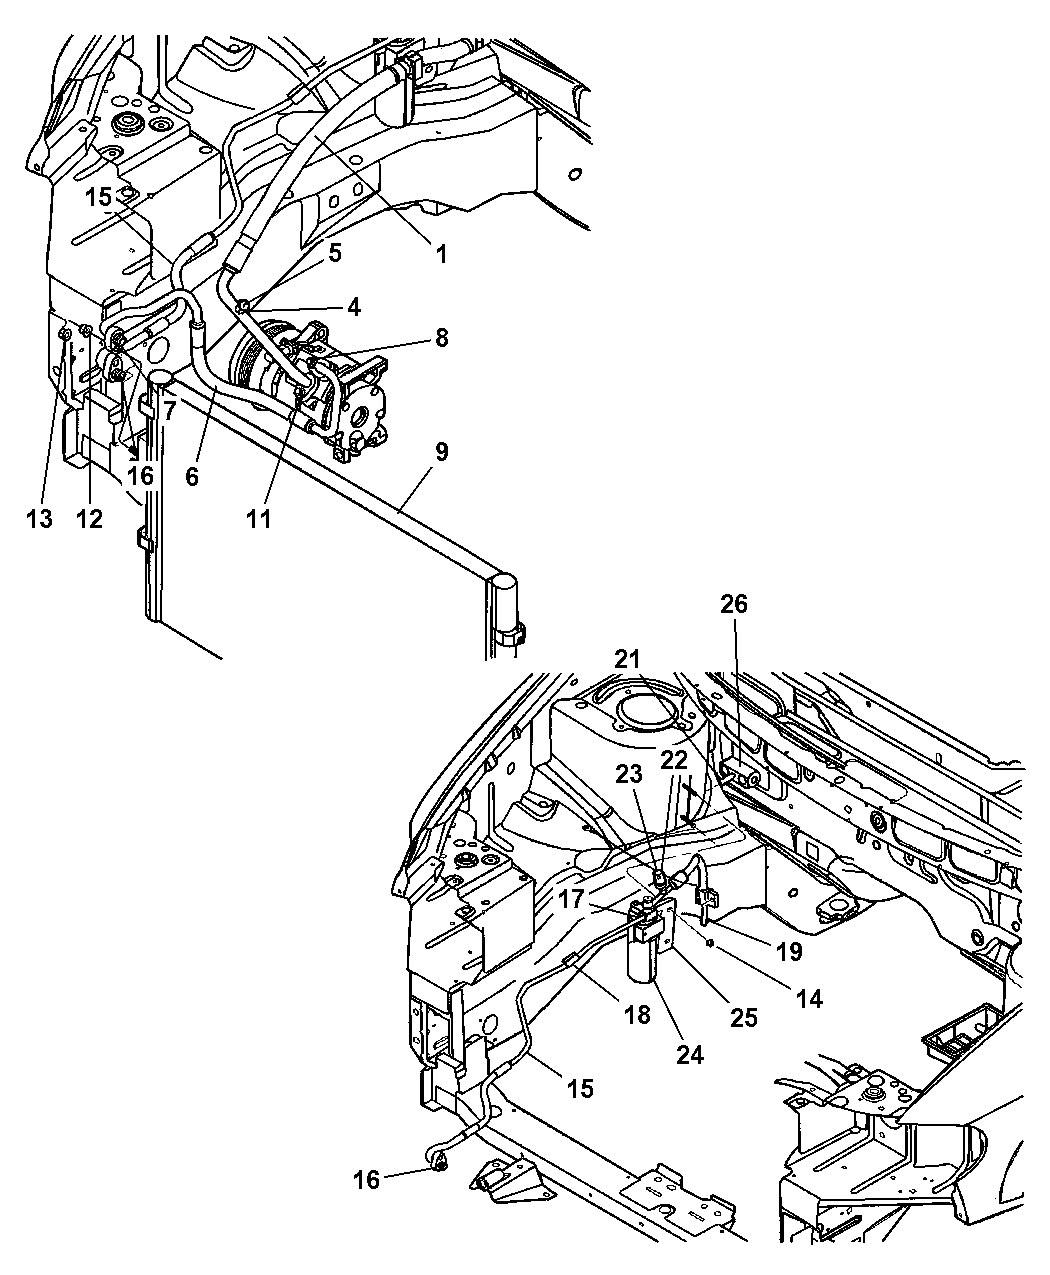 2003 Dodge Grand Caravan Engine Diagram